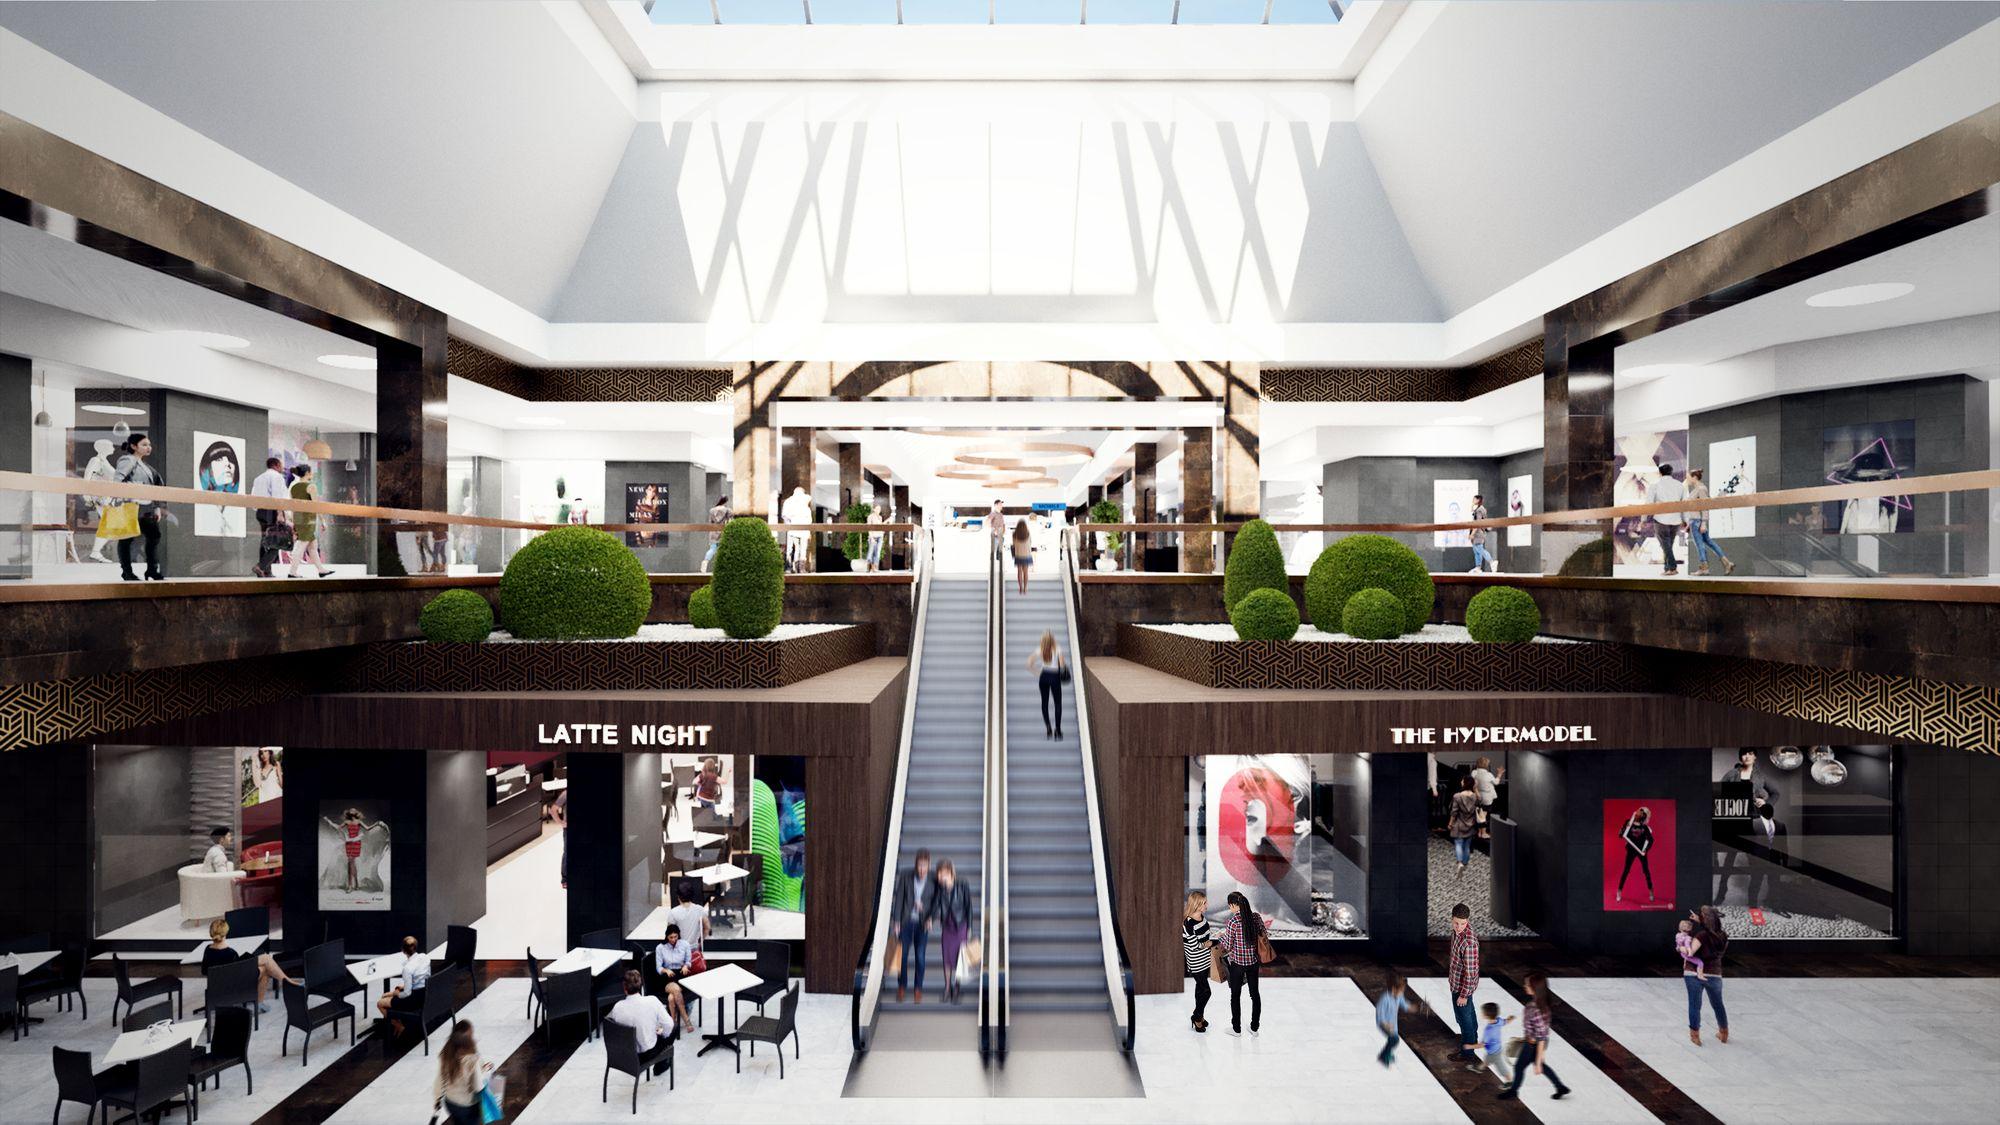 7513_kroh&partner_krakow-plaza_interior_escalator.jpg